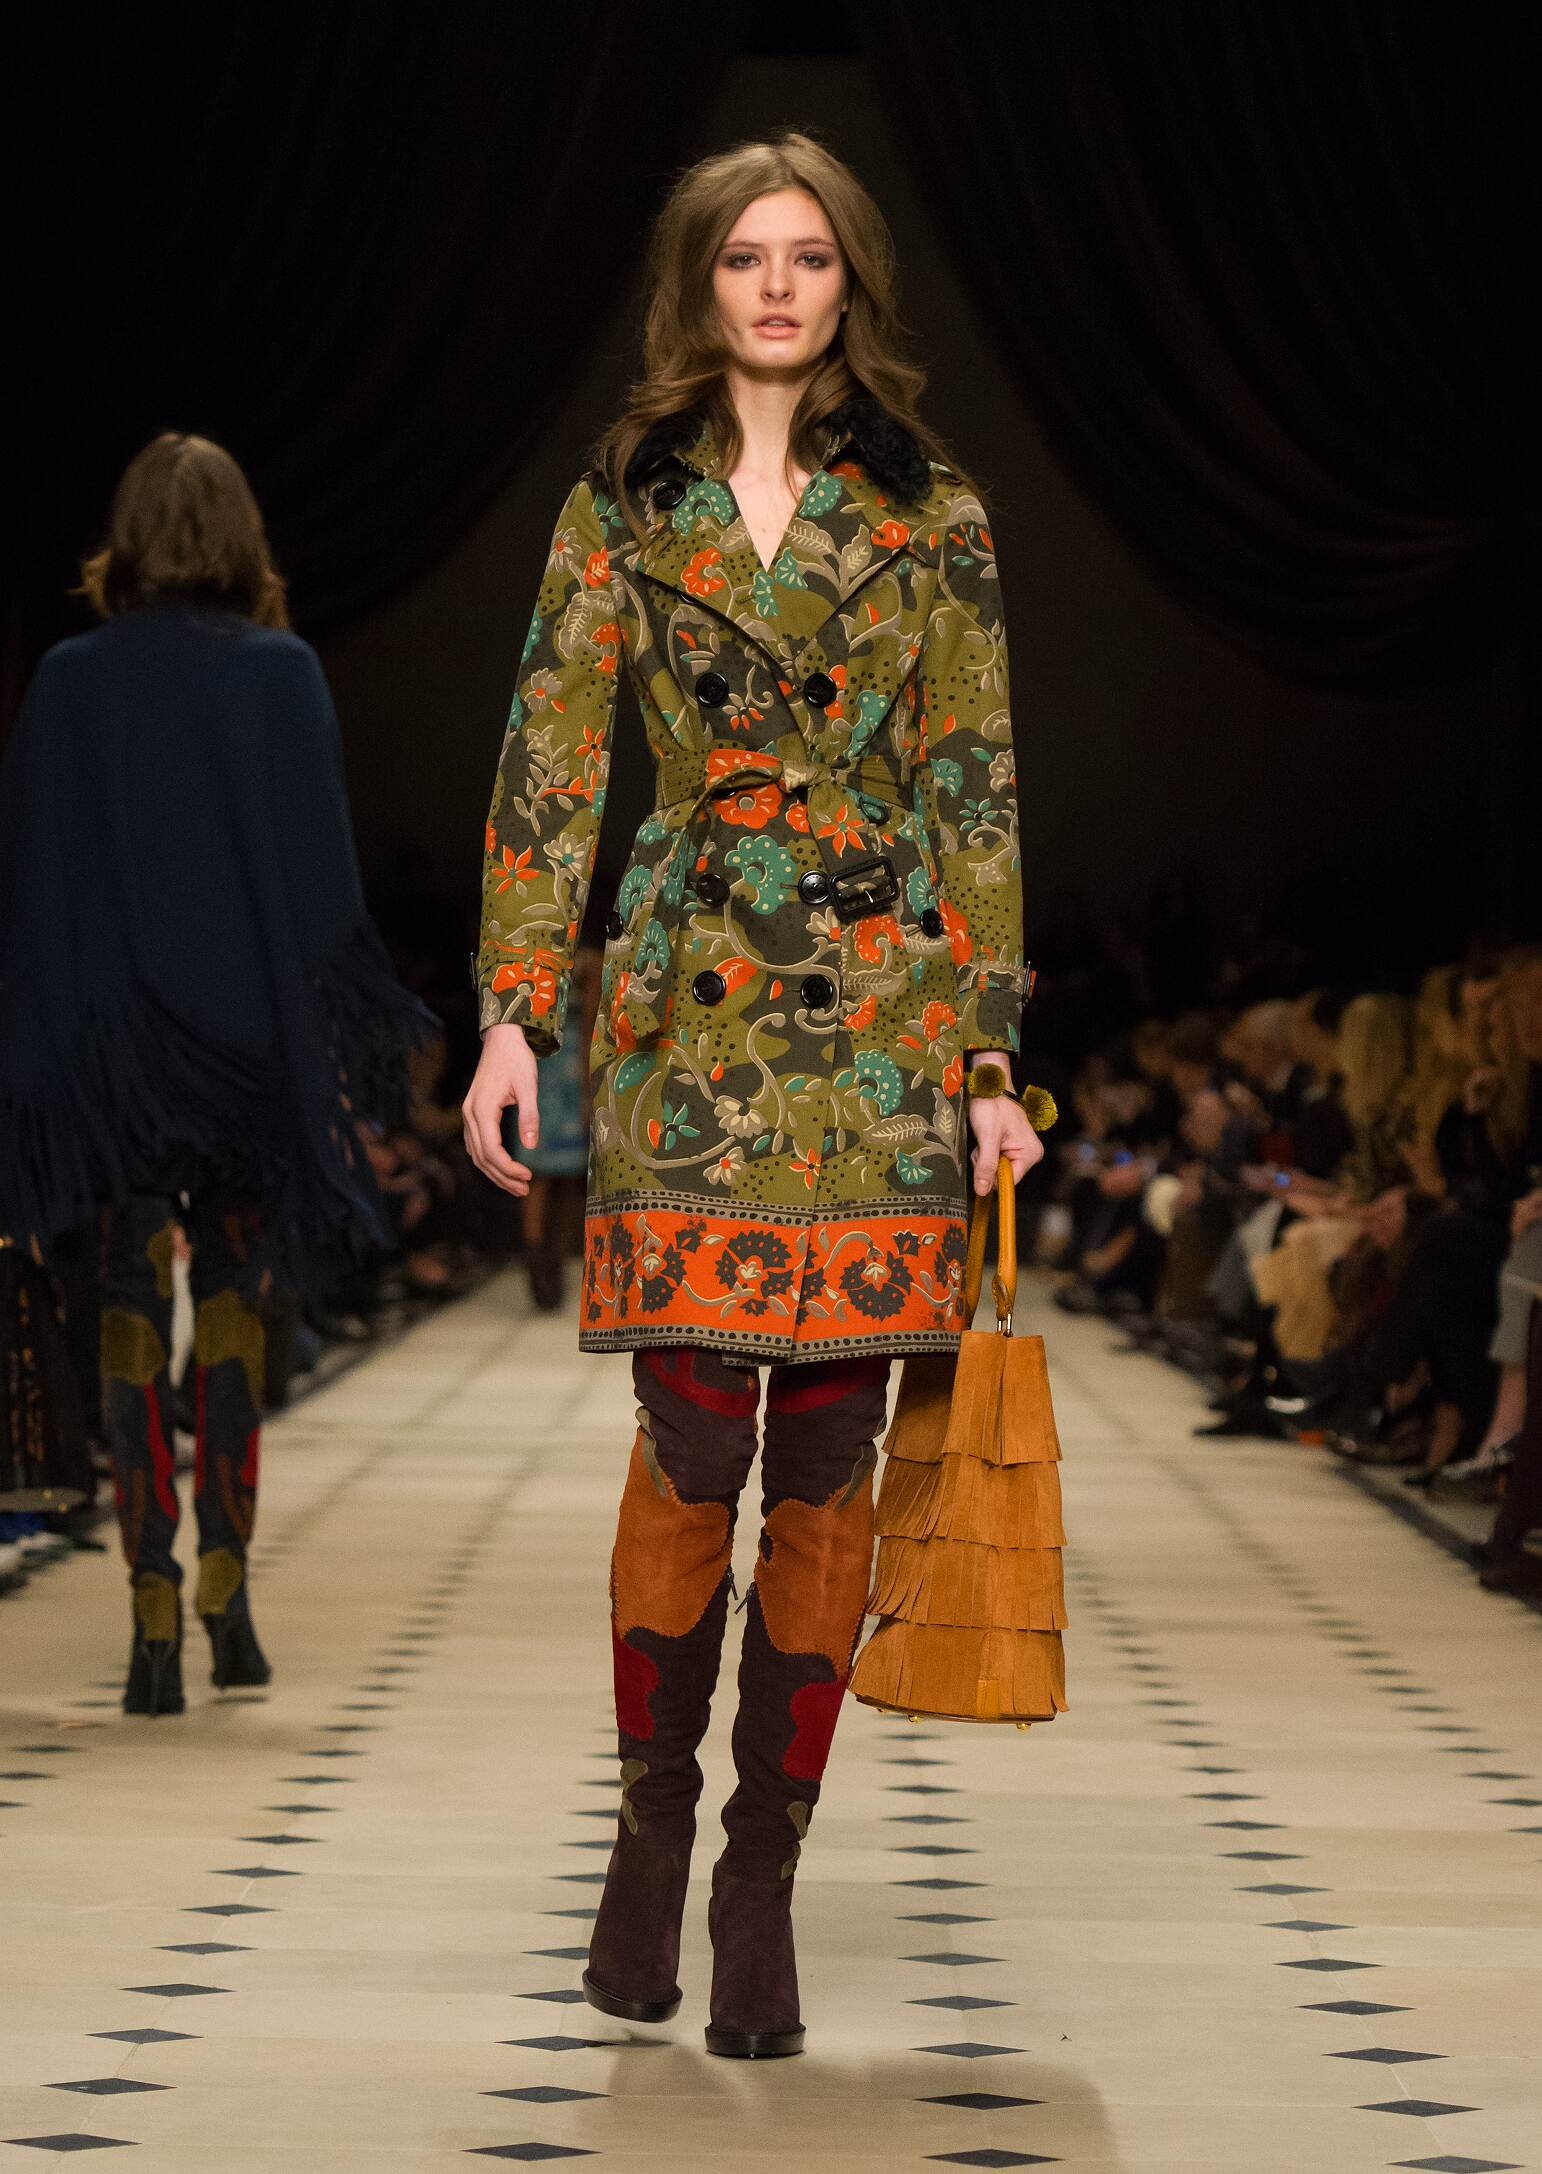 Burberry Prorsum Fall Winter 2015 16 Women S Collection